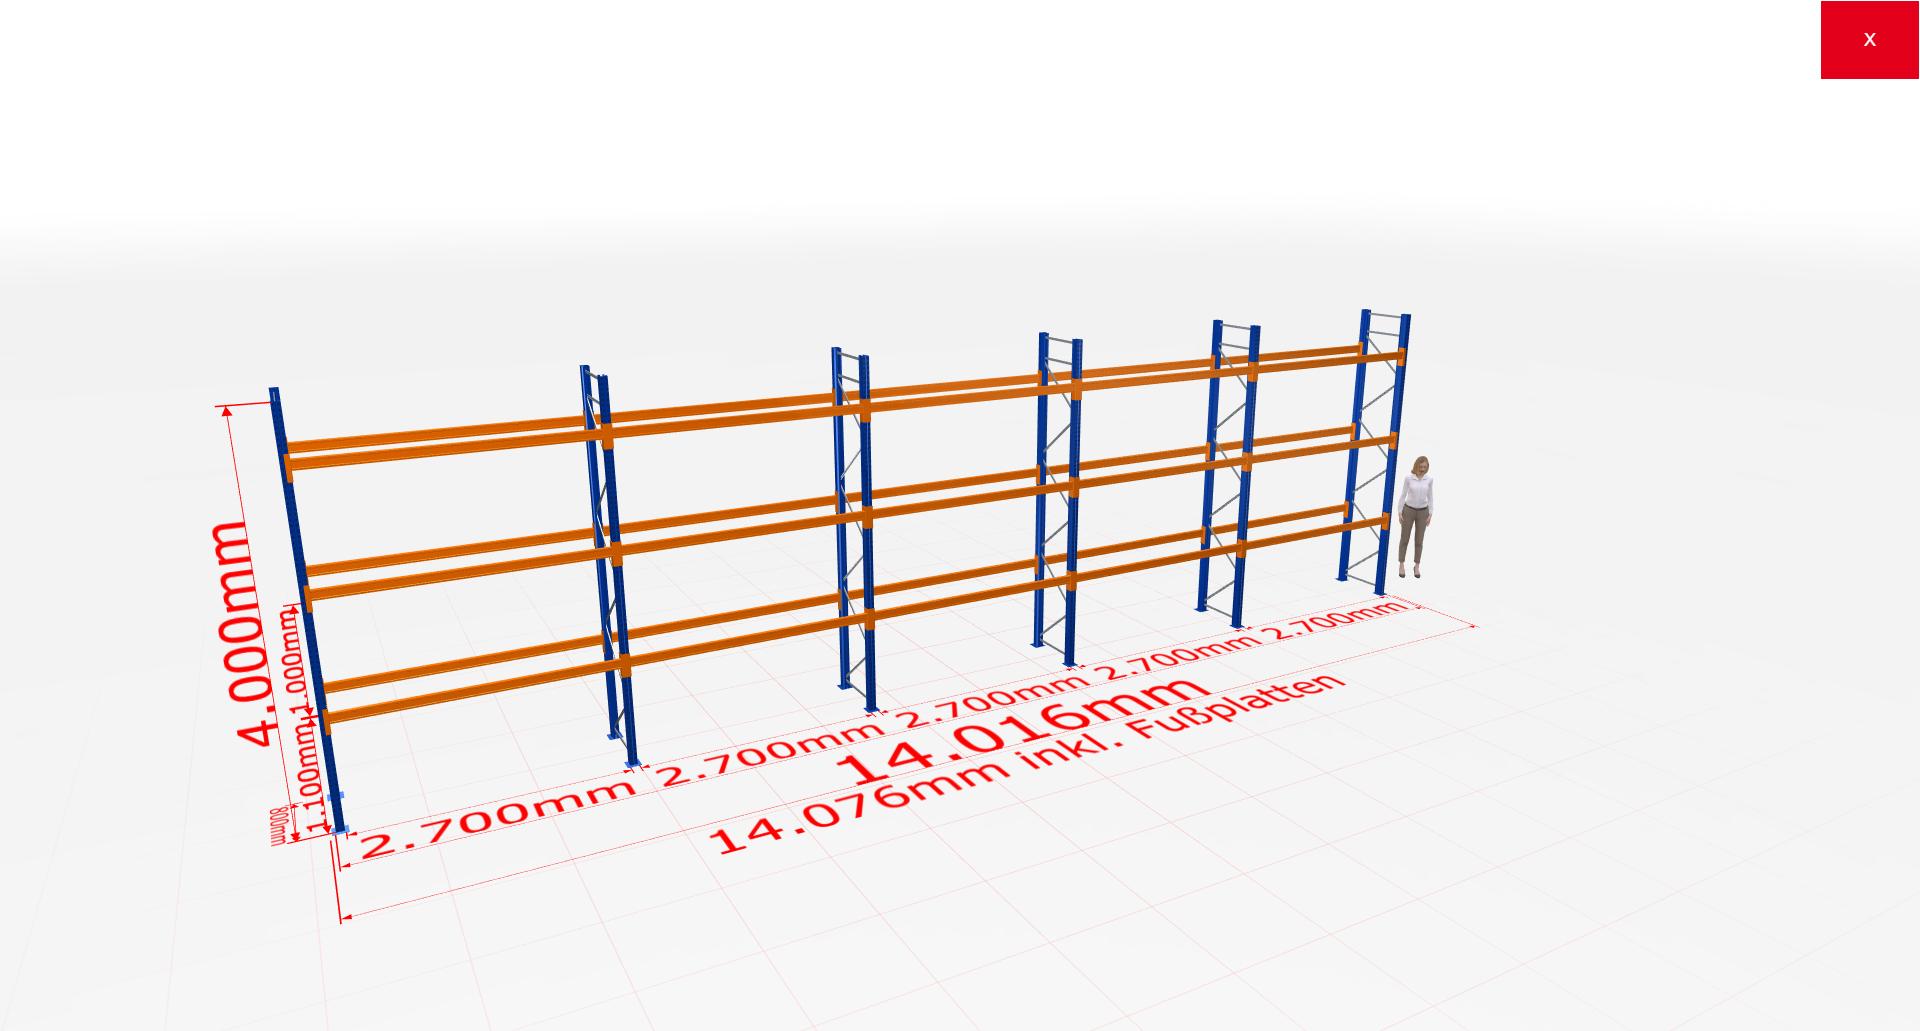 Palettenregal Komplettregal 4000x14016x800 mm (HxBxT) 3 Fachebenen SCHULTE Lagertechnik